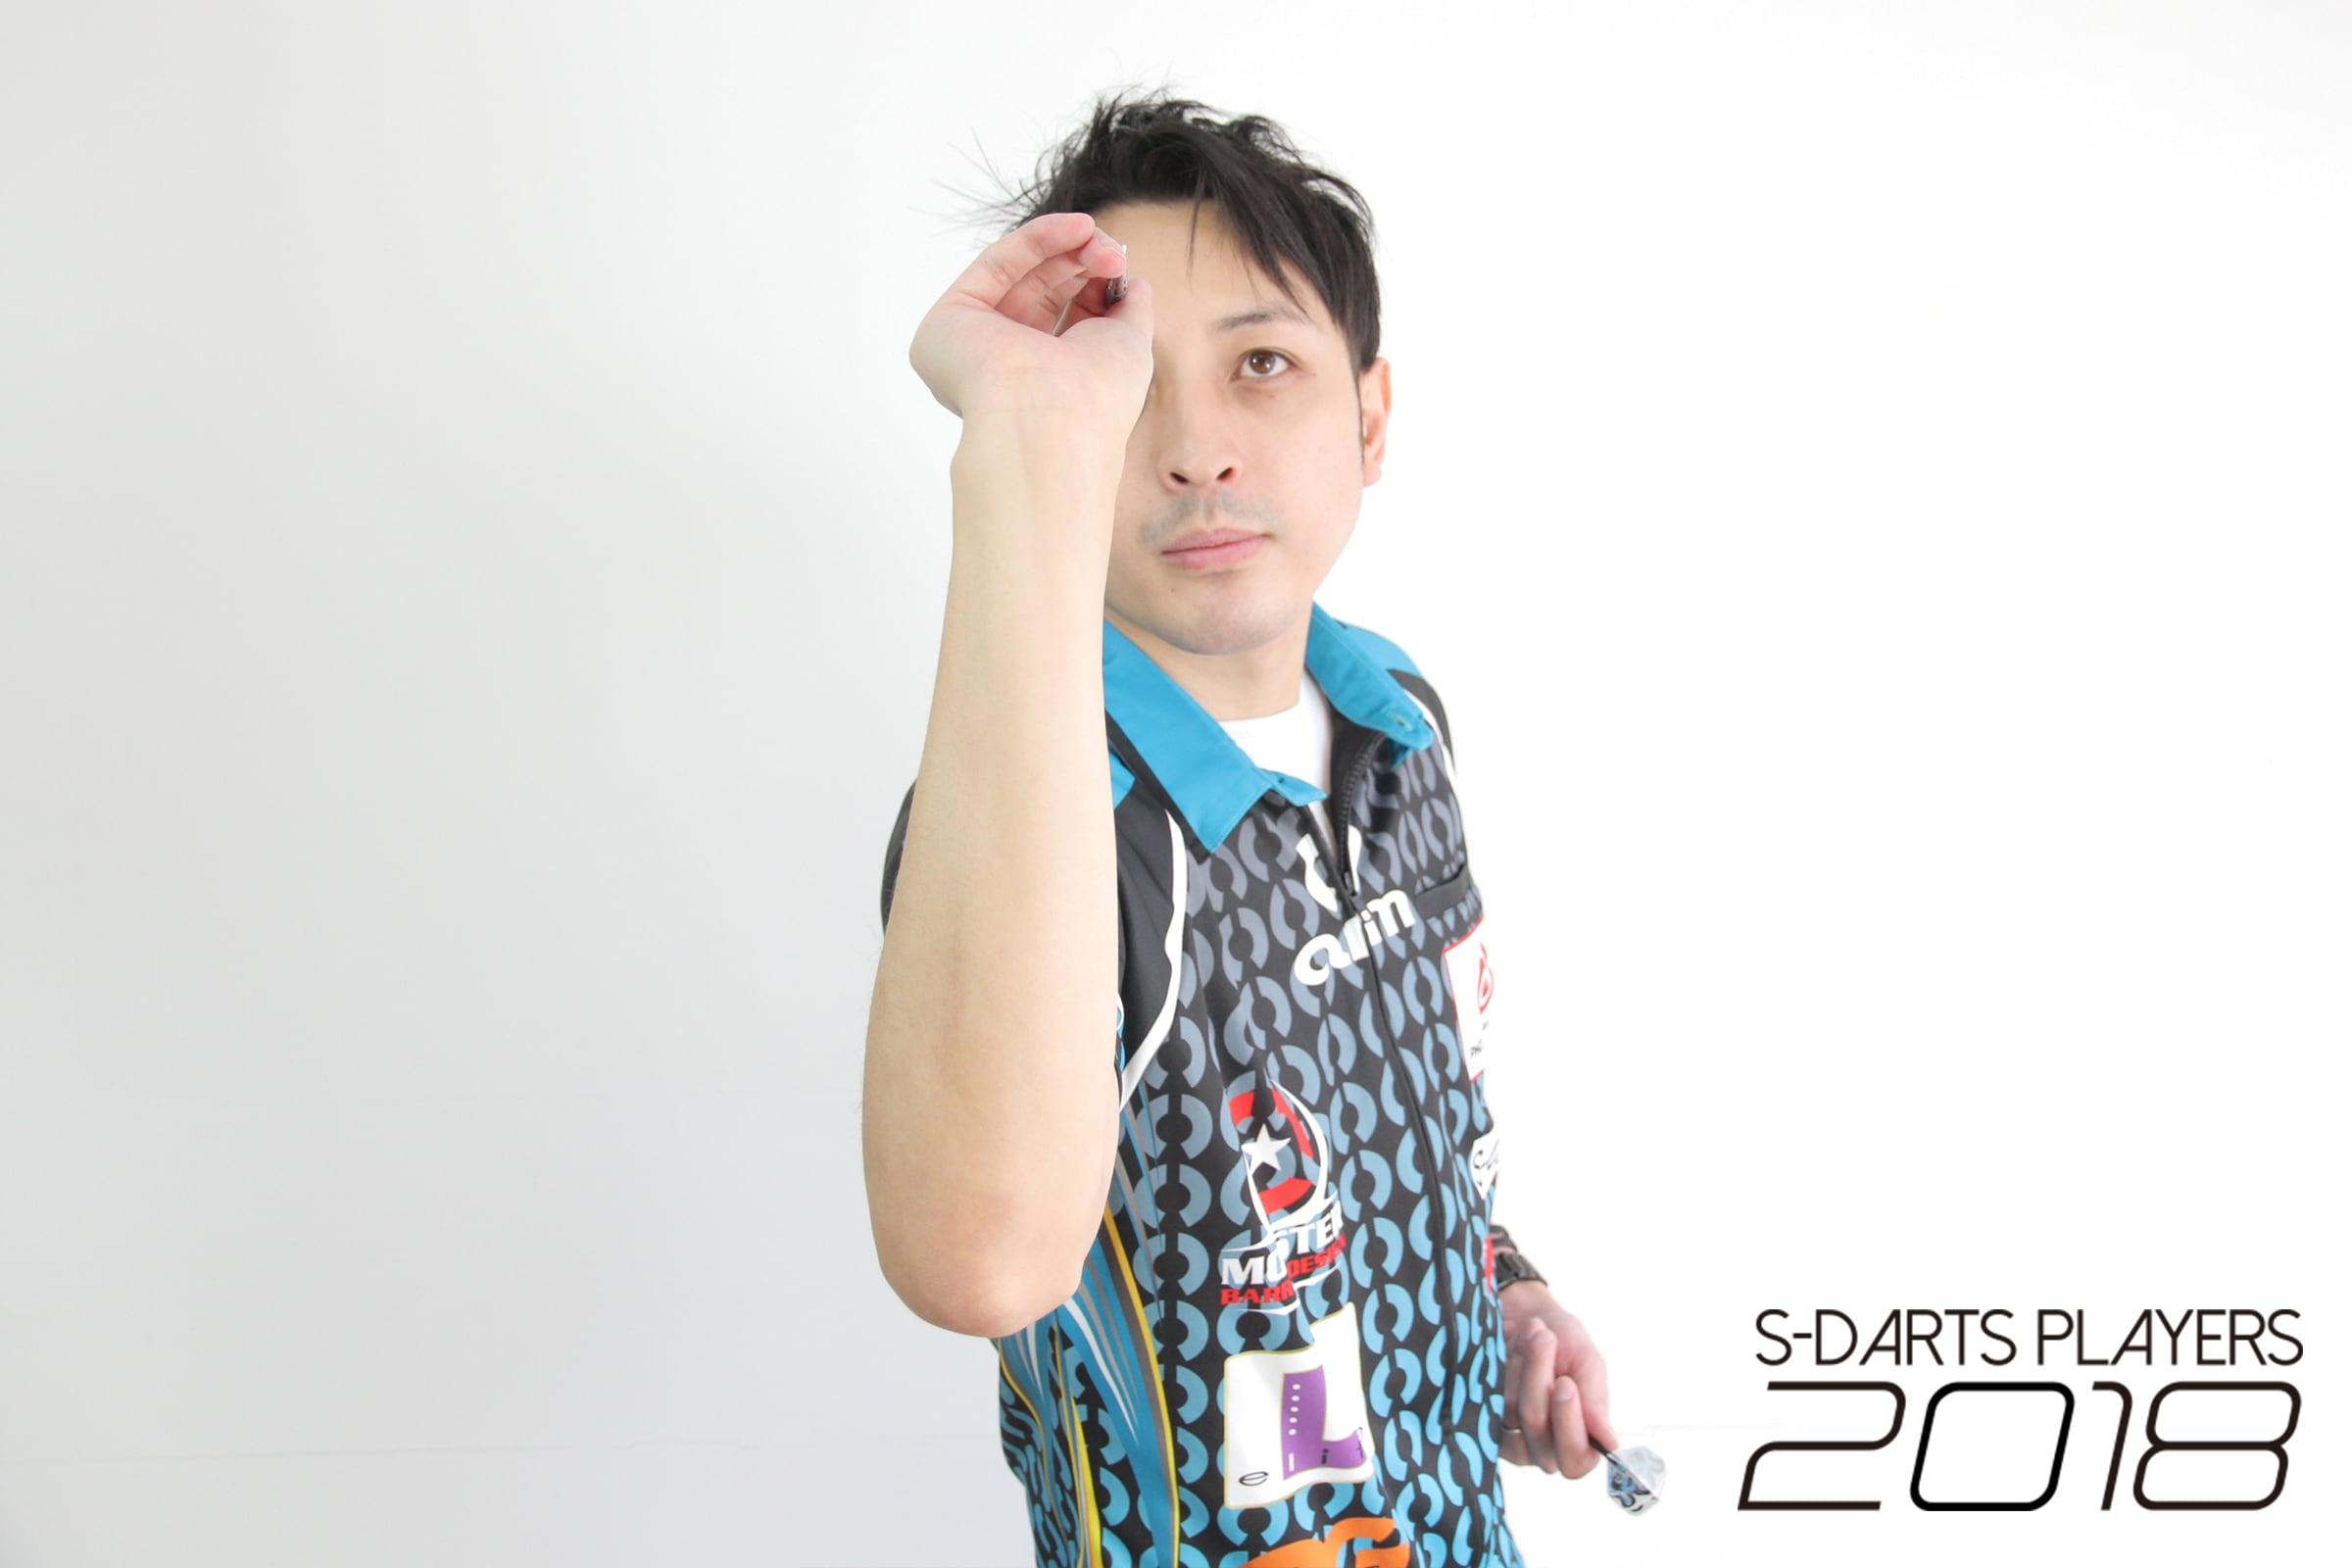 S-DARTS PLAYERS 2018│鈴木 徹